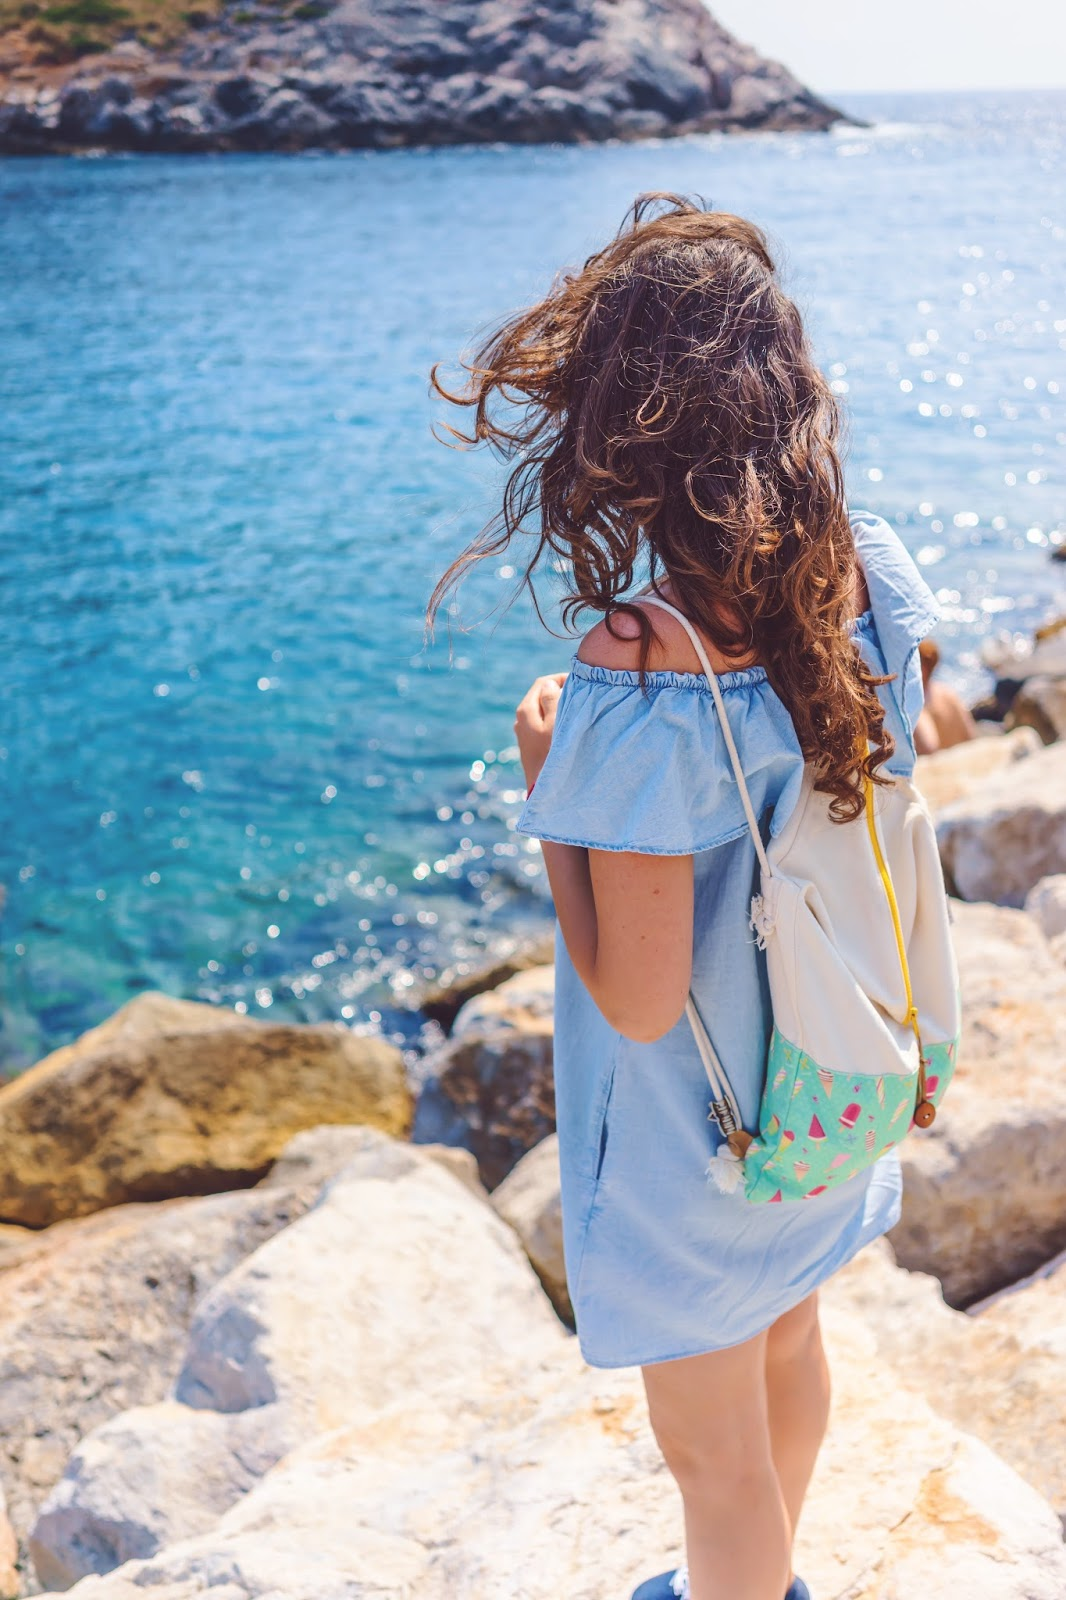 Sommerurlaub inspirationsliste